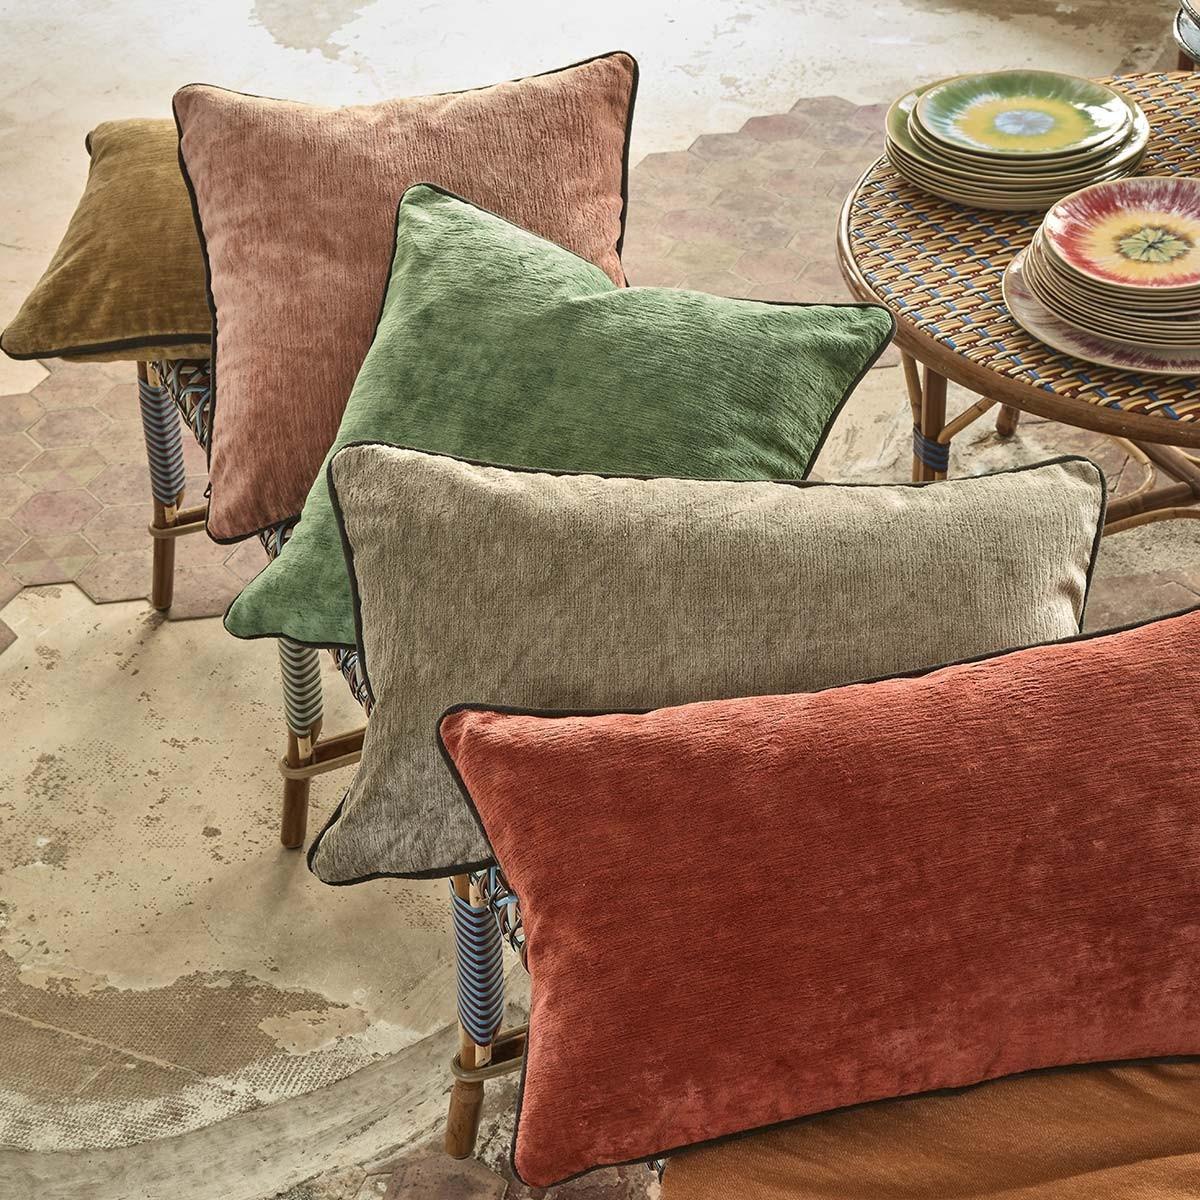 BOROMEE Cushion Cover